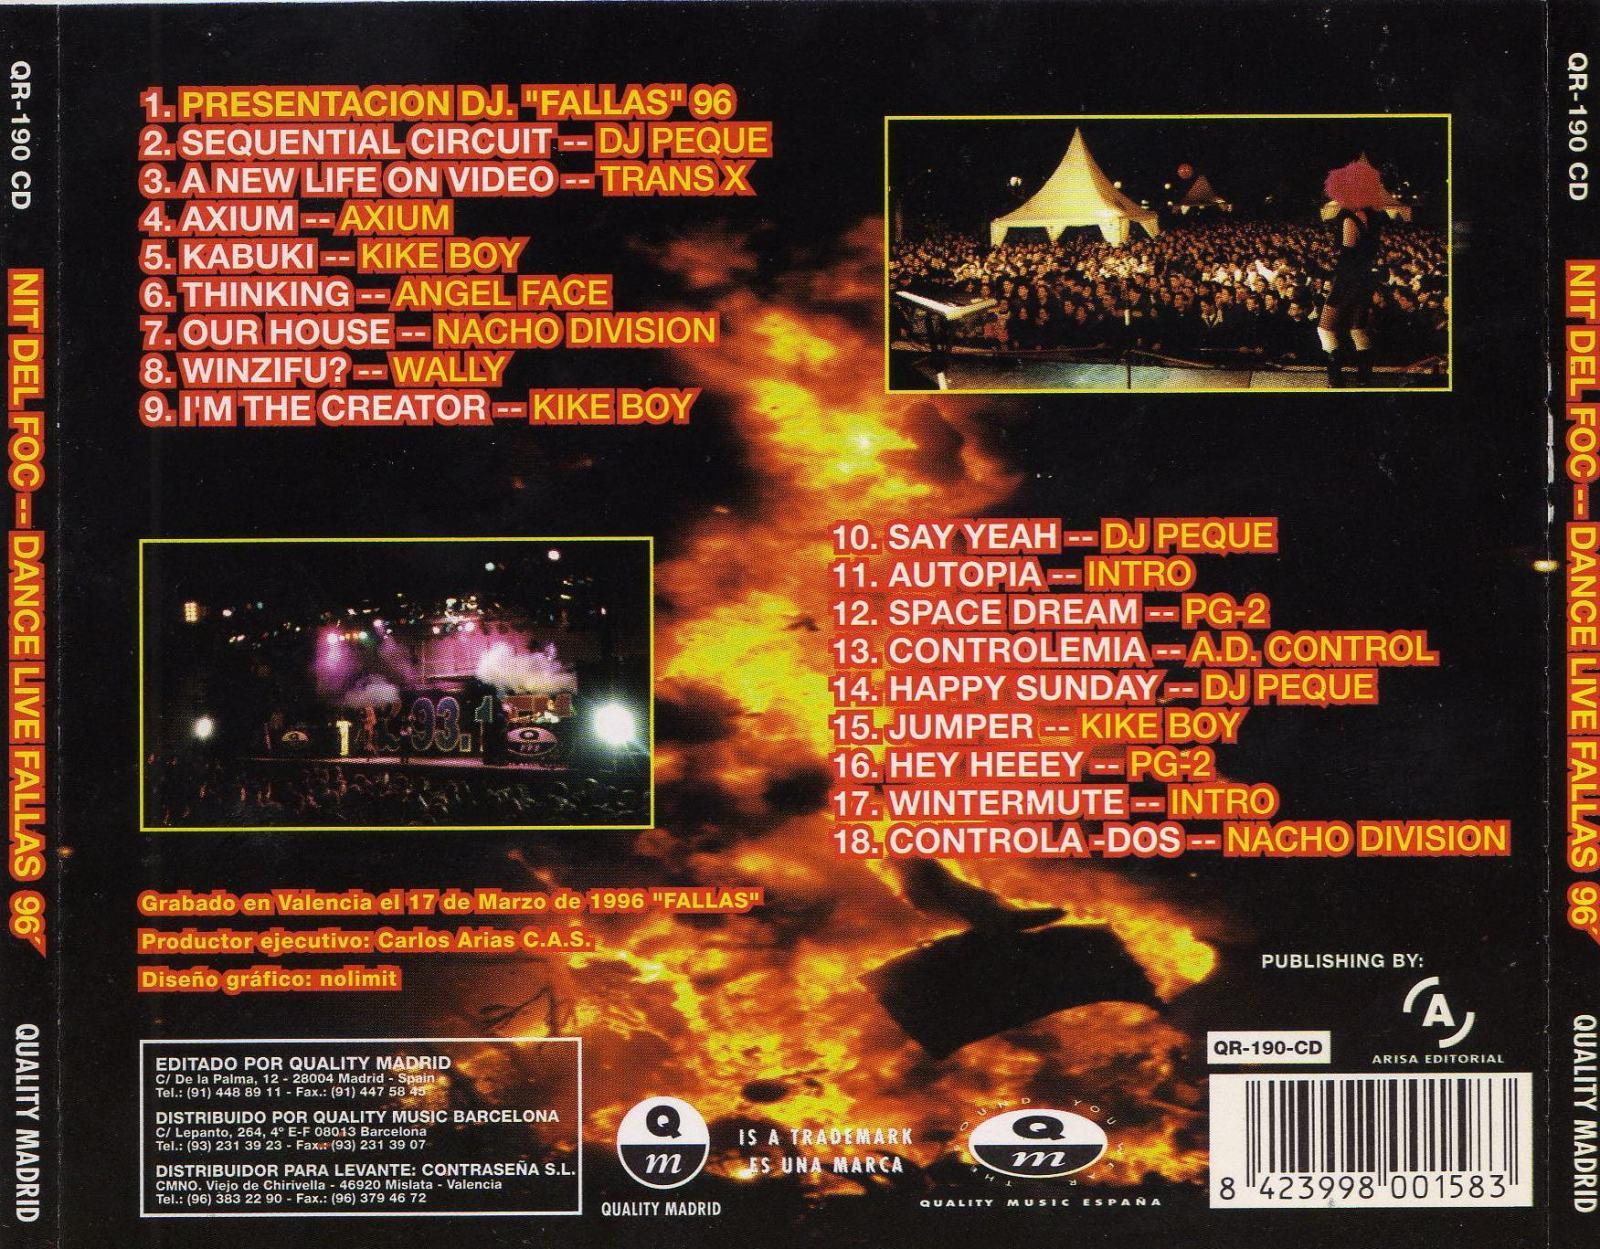 NIT DEL FOC - 1996 - COMPILATION - 192KBPS - QUALITY MADRID 2isa7m8